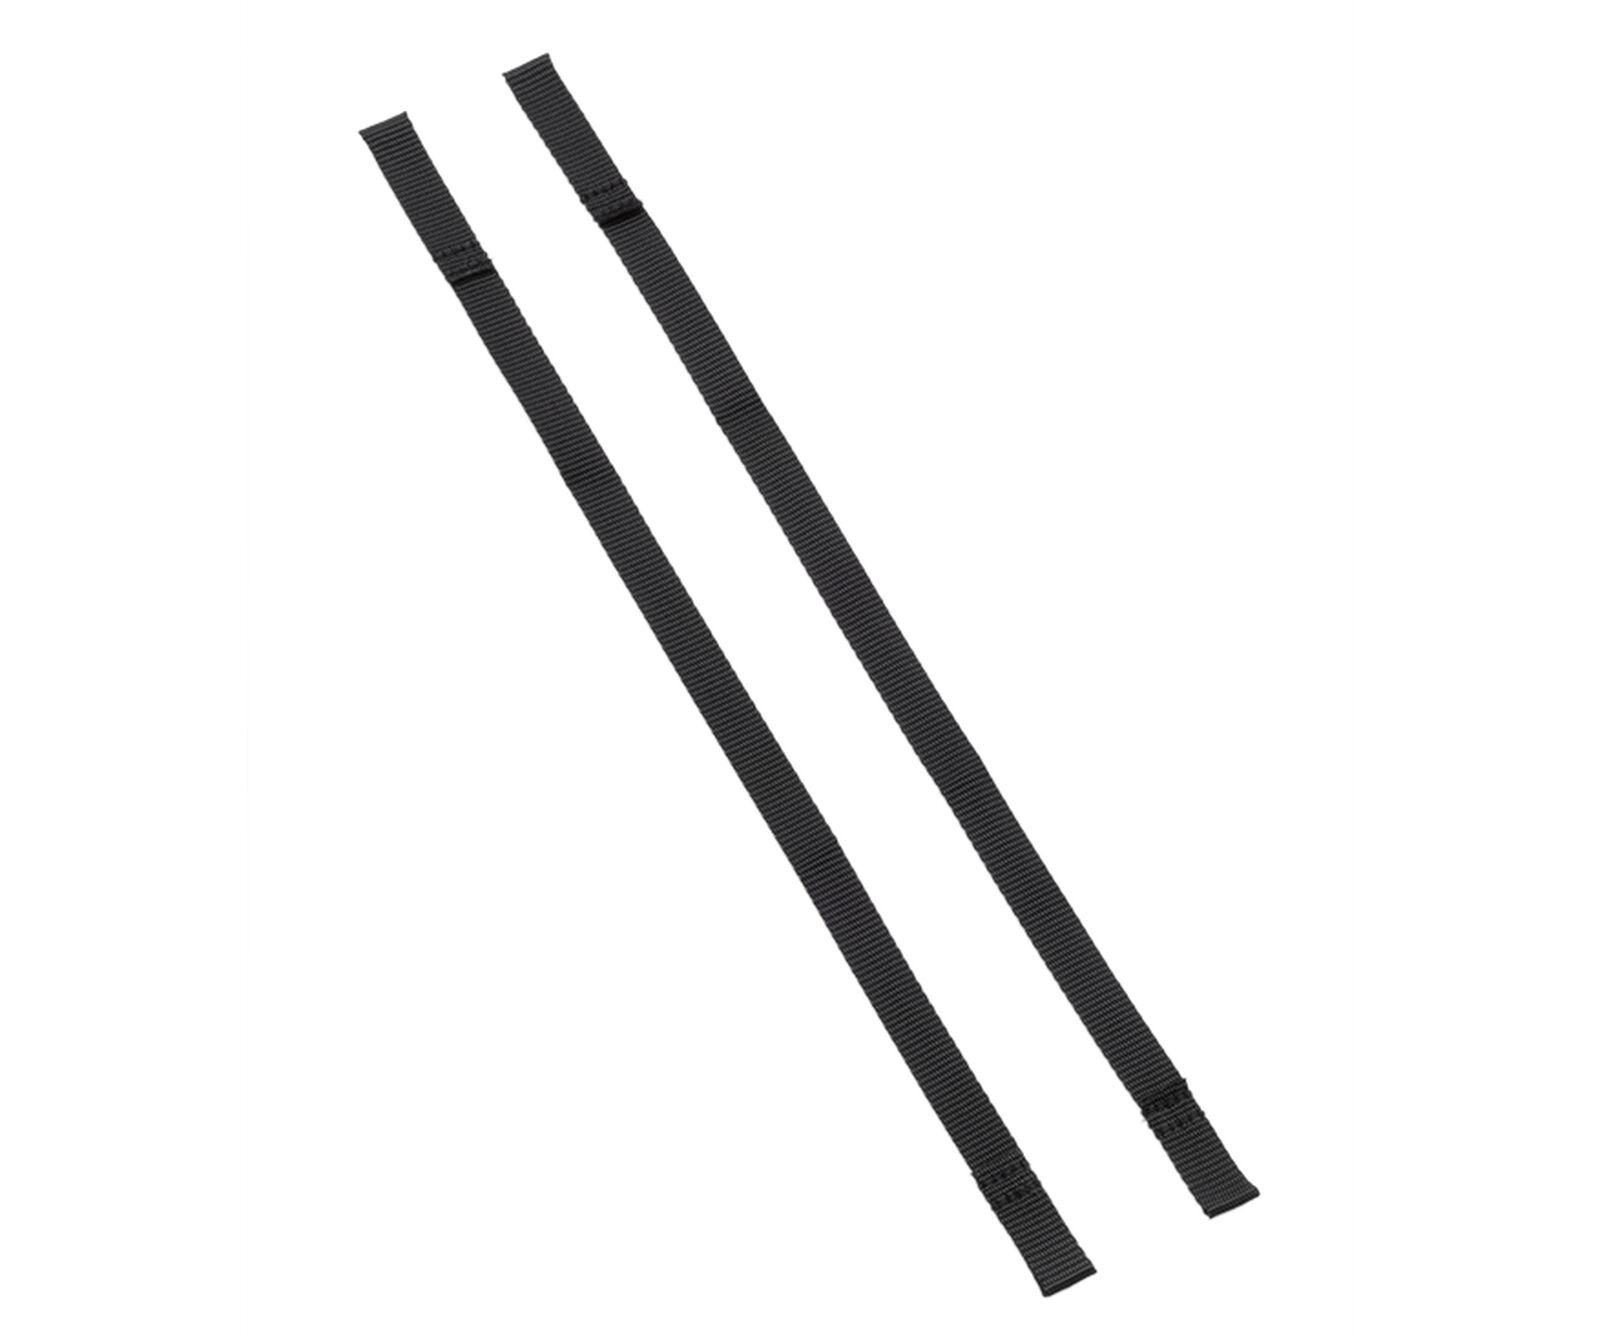 attachment straps replacement set